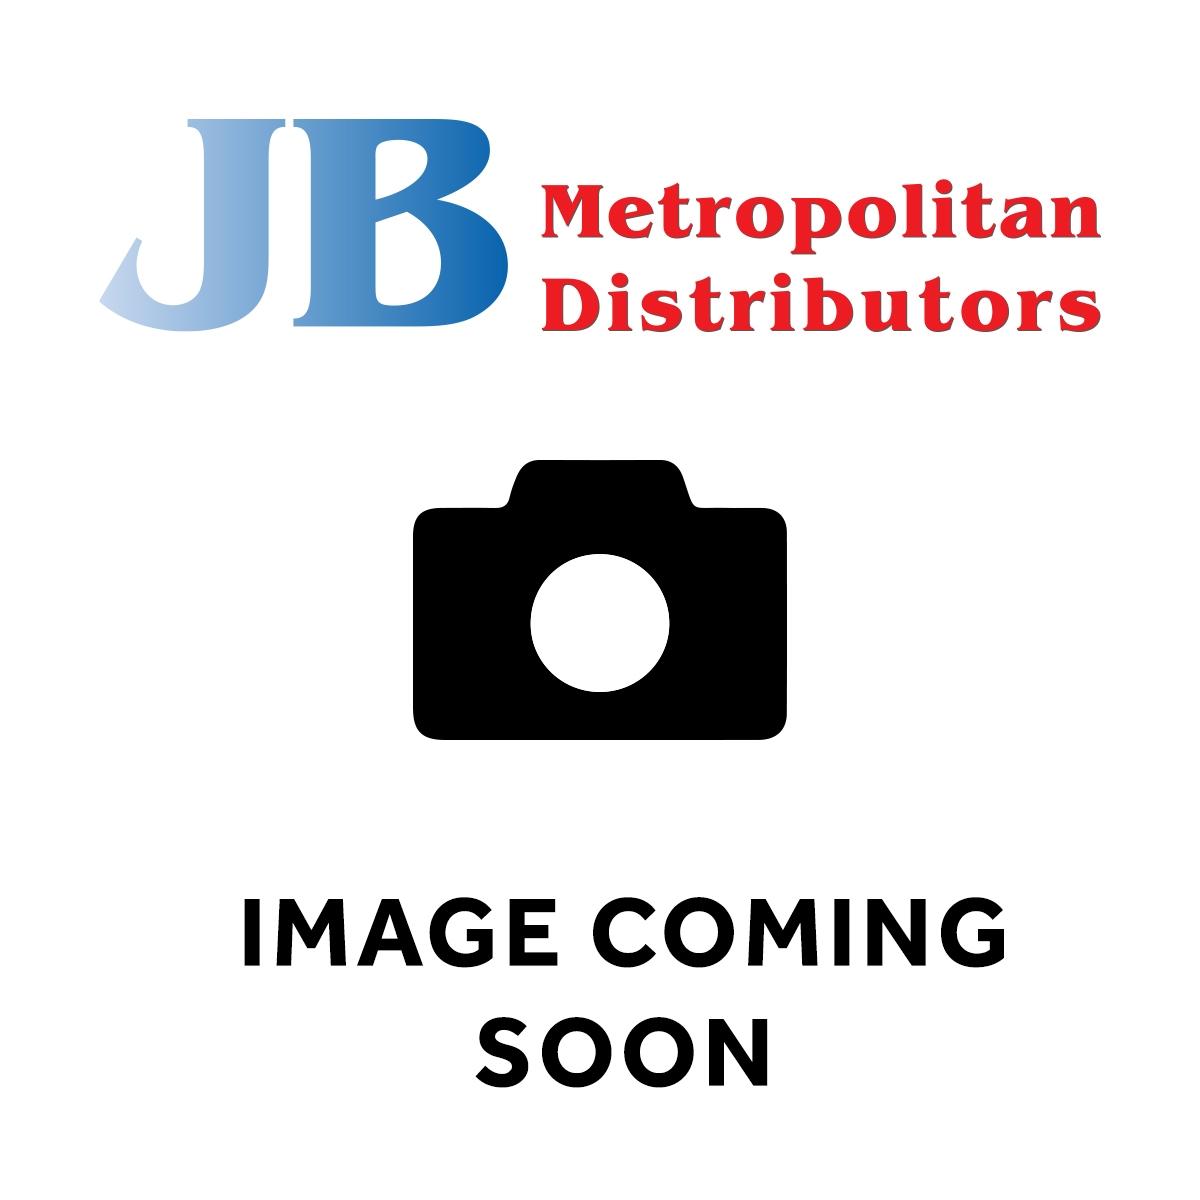 35G HUBBA BUBBA STRAWBERRY